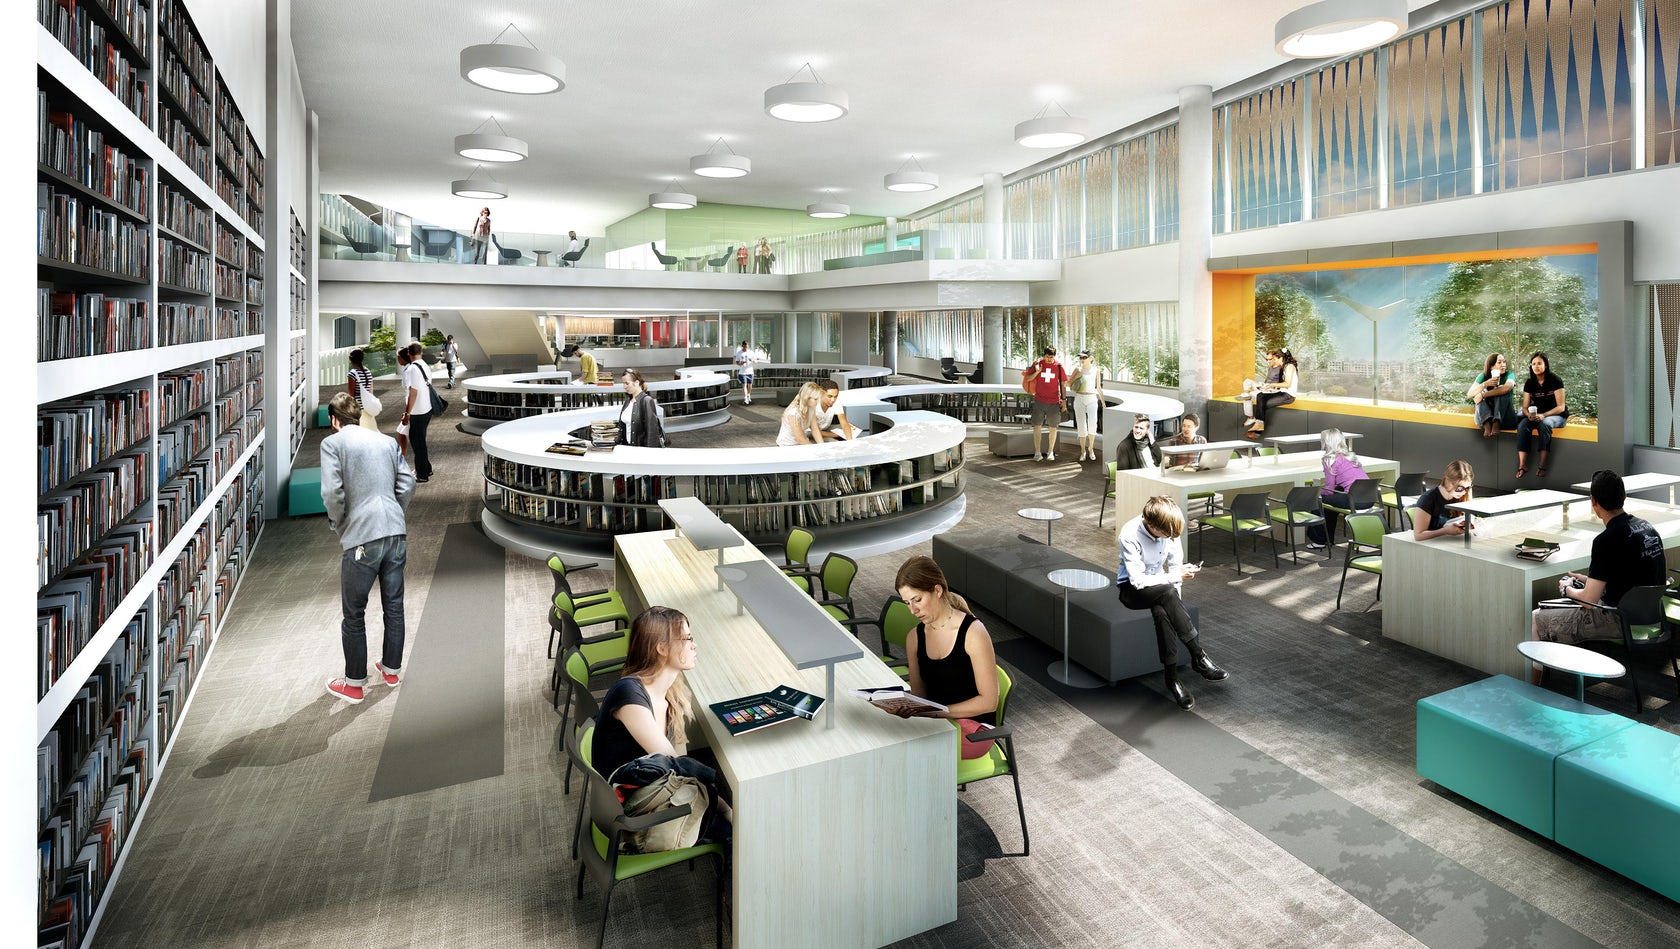 UIC Richard Daley Library Addition Master Plan on Architizer